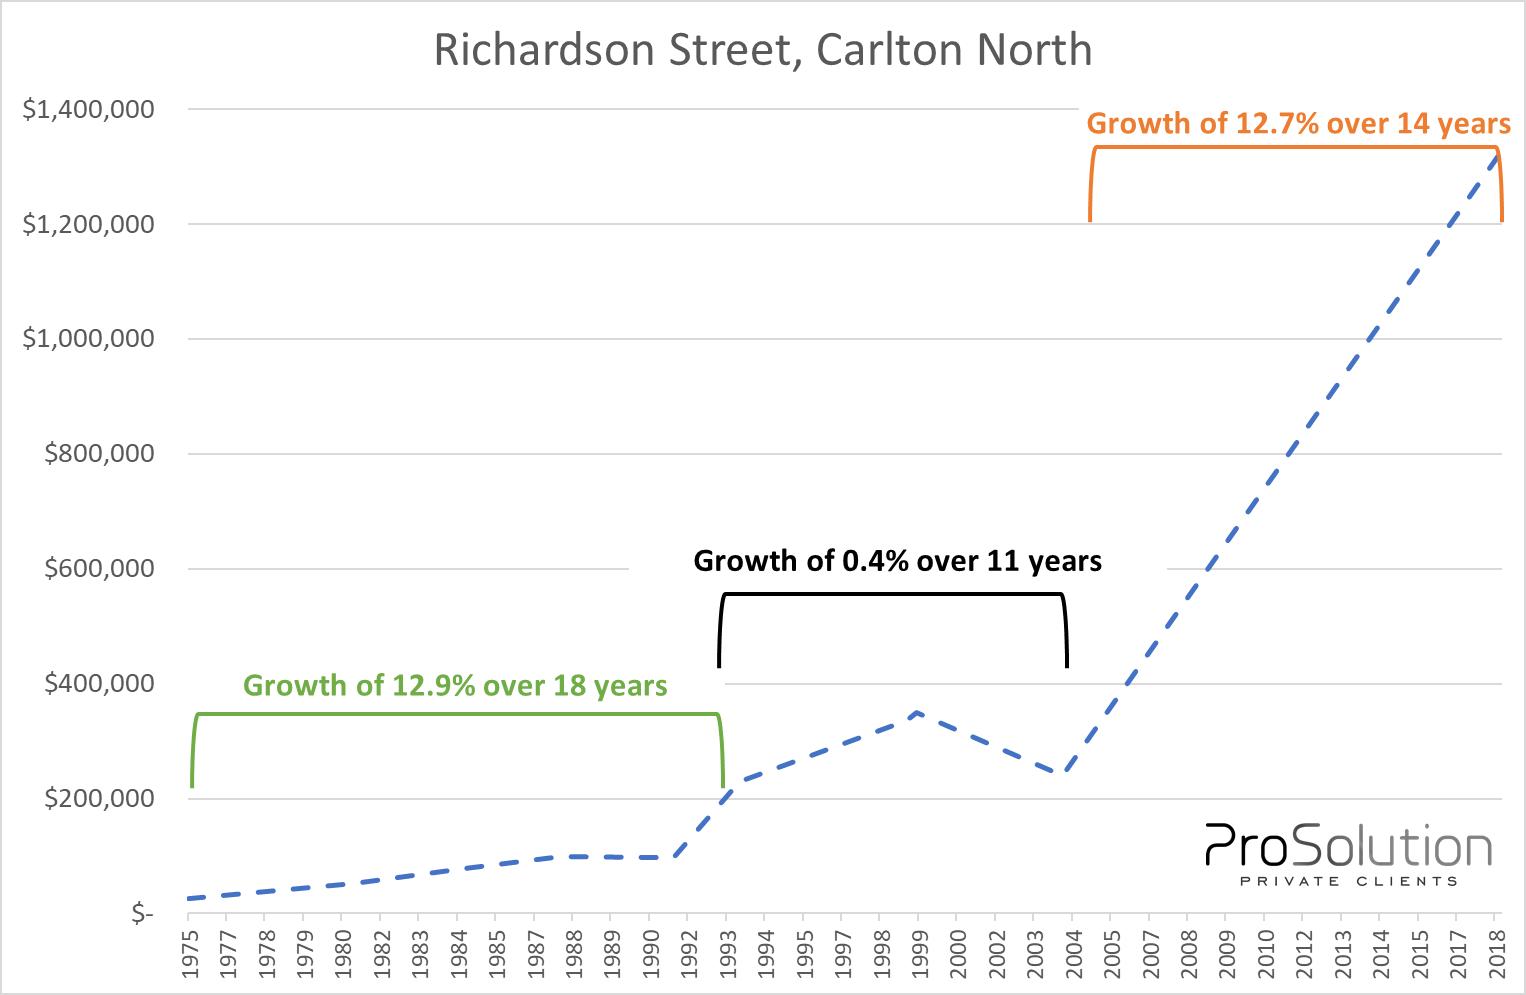 Non linear growth